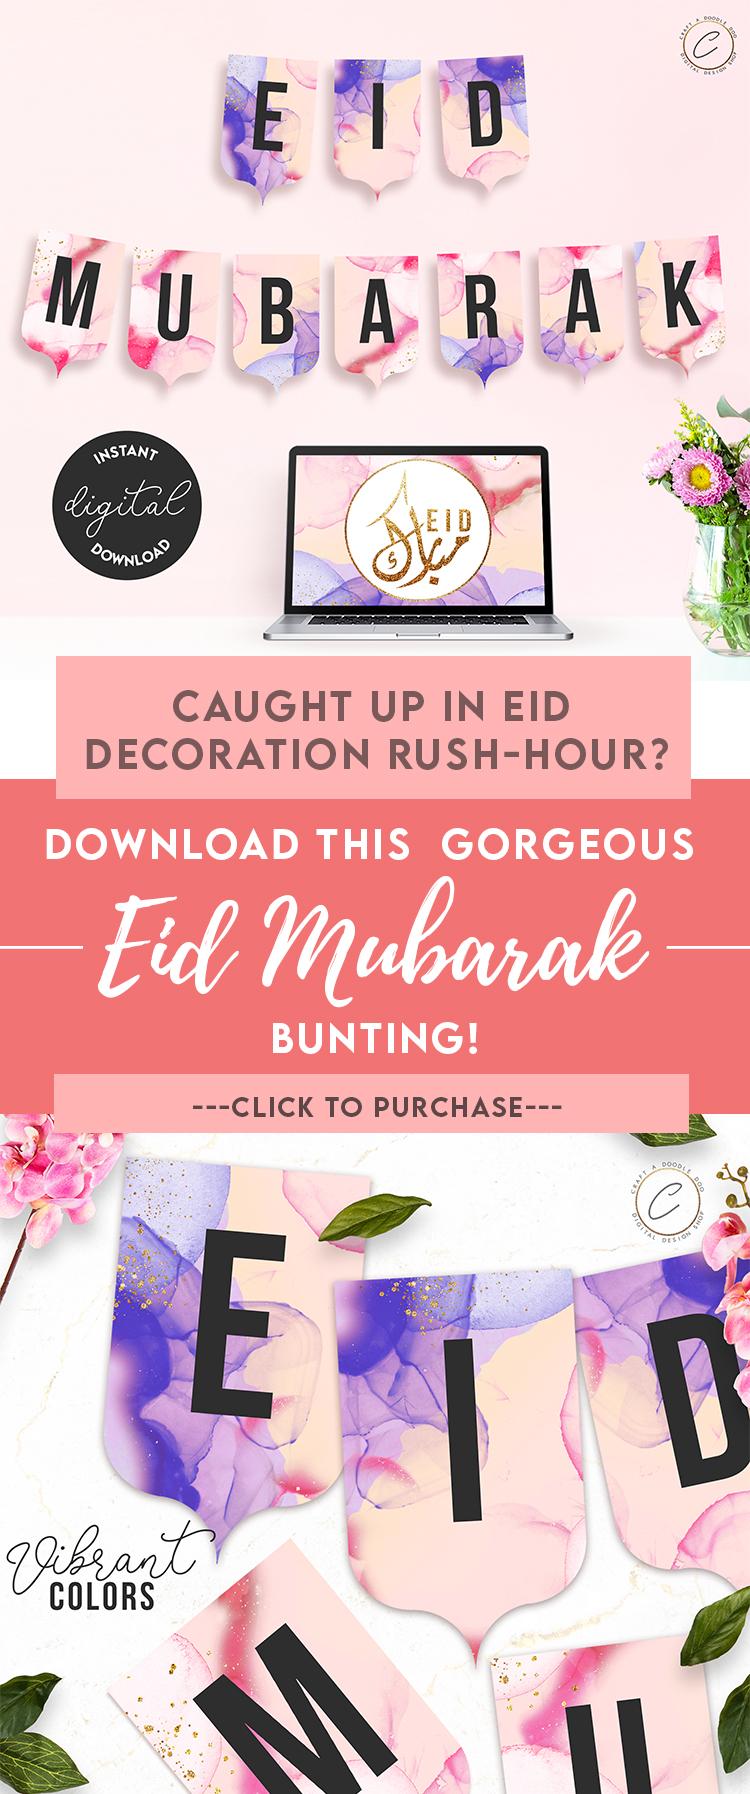 Eid Mubarak Bunting | Eid Al Adha Banner decoration | theme party diy decor for kids available on Etsy by Craft A Doodle Doo #eiddecorationideas #printableeidbanner #printableeidbunting #eidbannerdesign #eidhomedecor #eidwalldecor